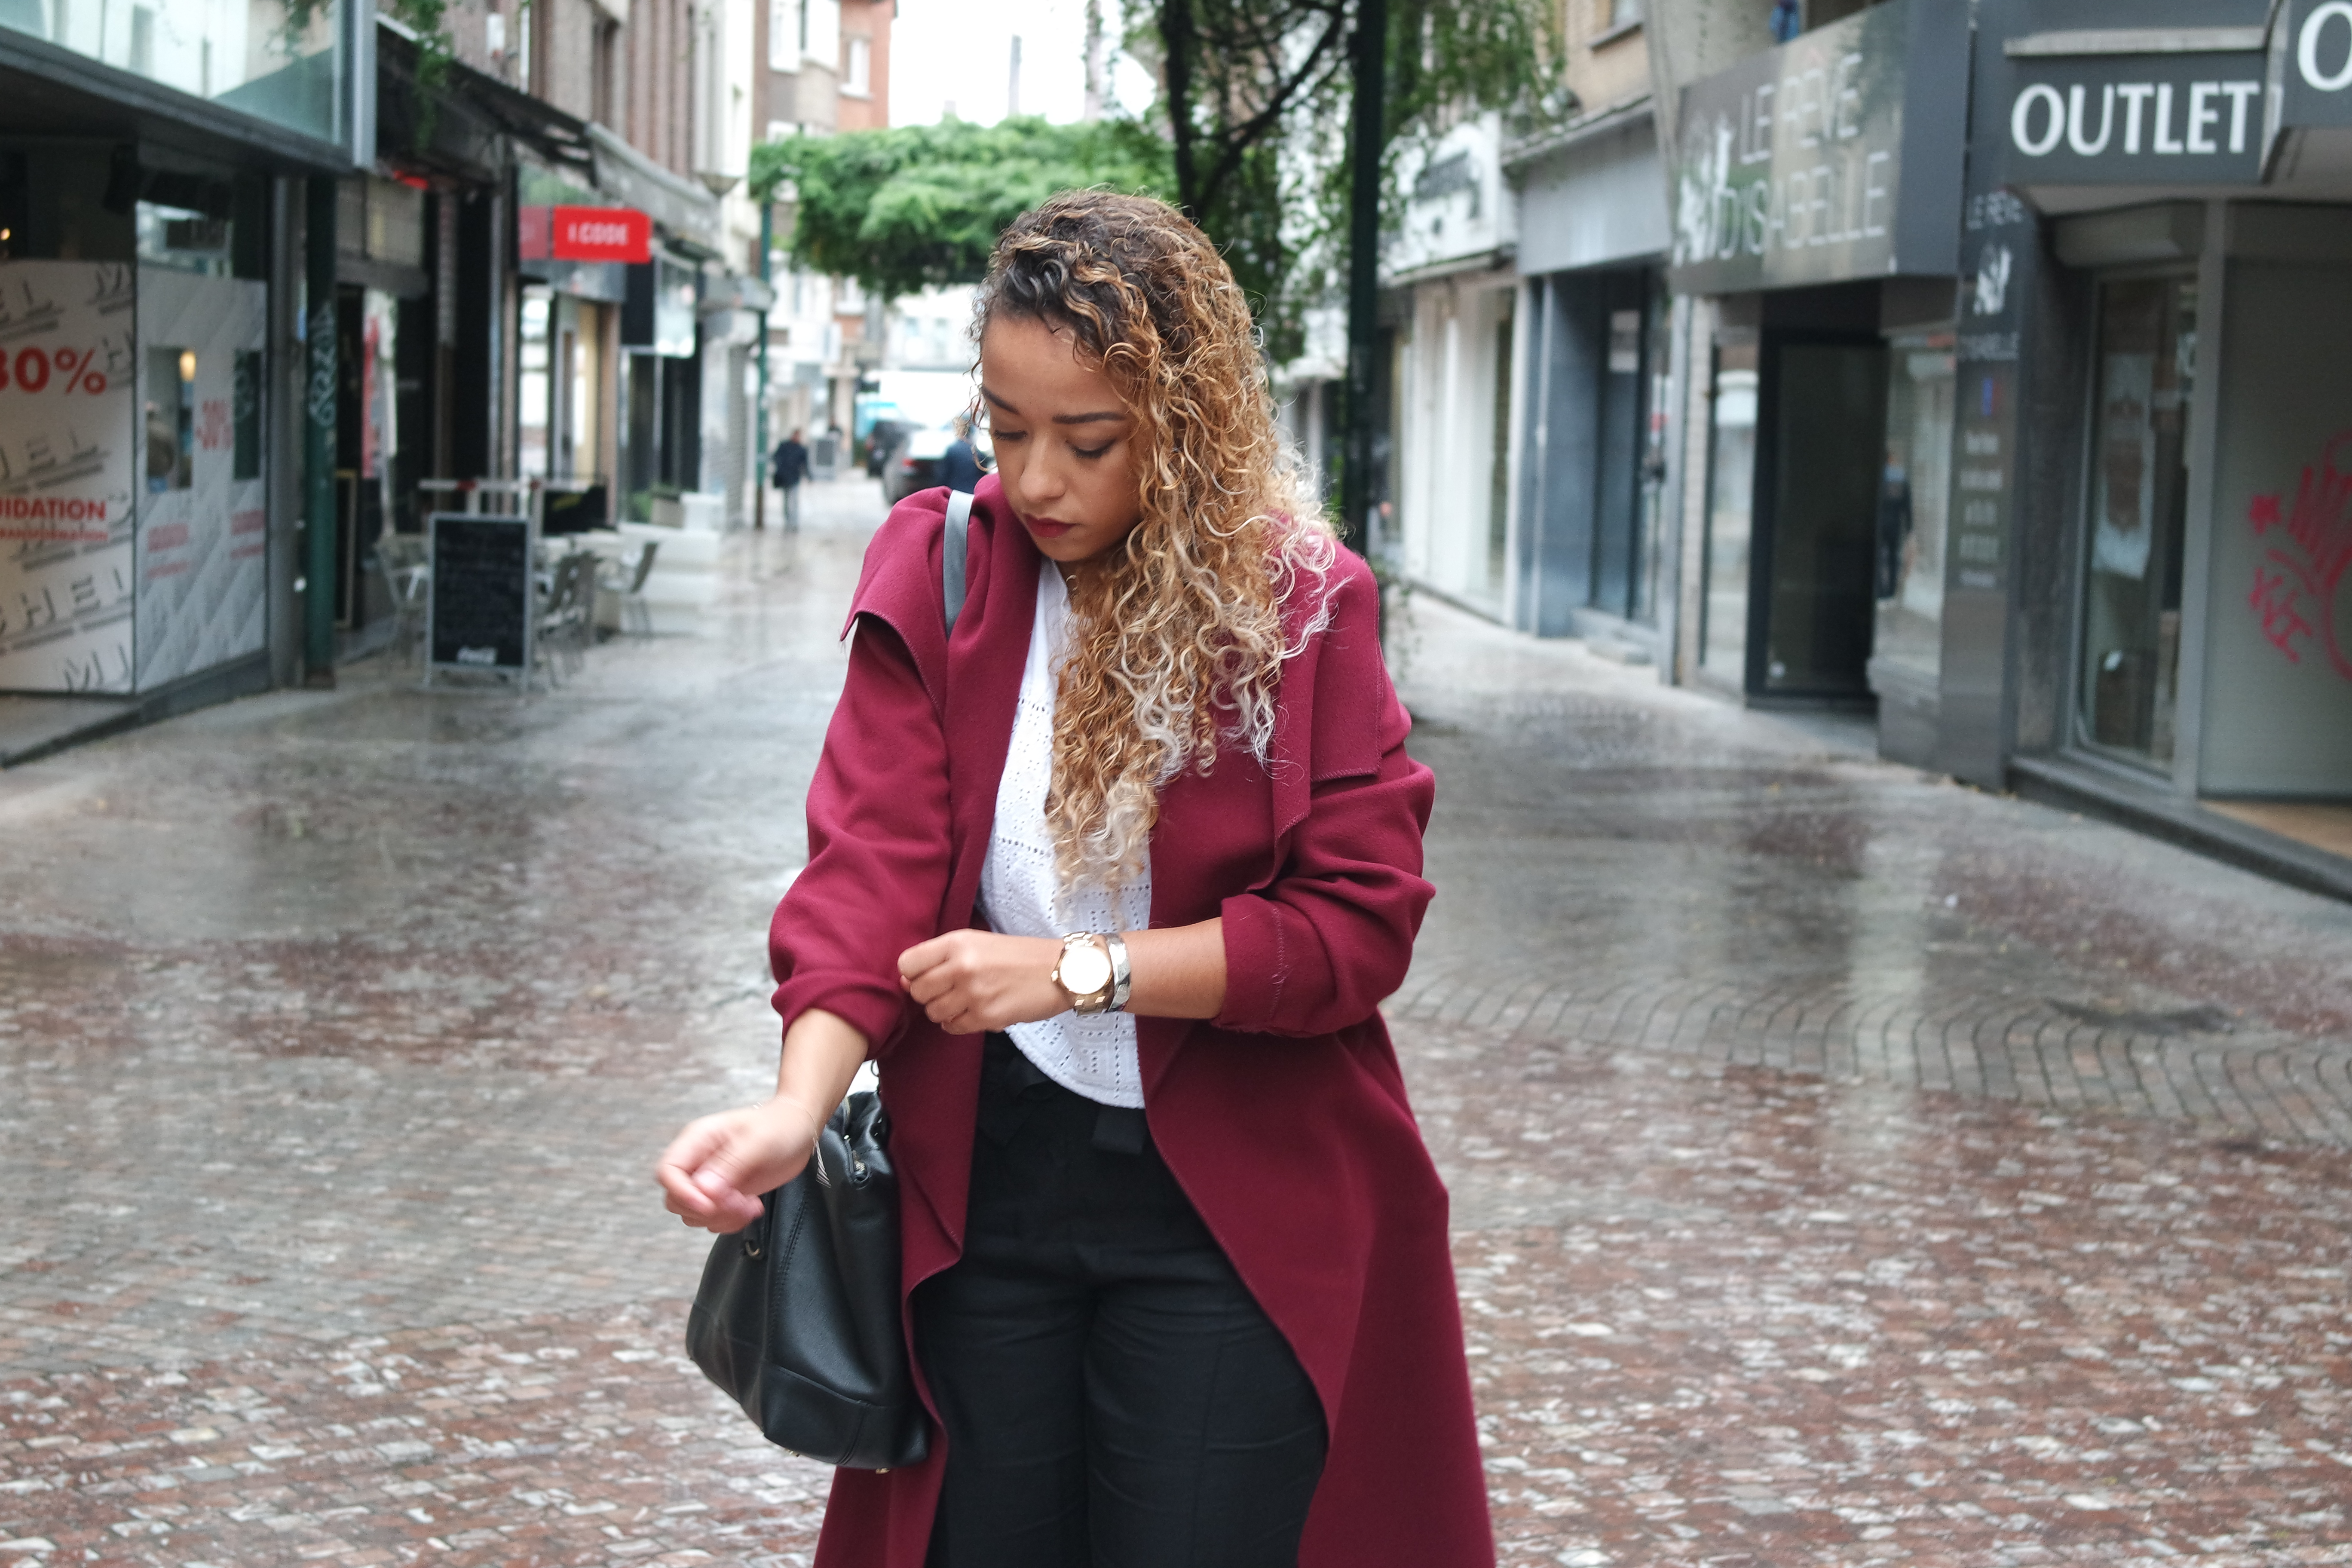 zalando-creative-content-award-belgium-canada-blog-style-mode-rue-dampremy-charleroi-premiere